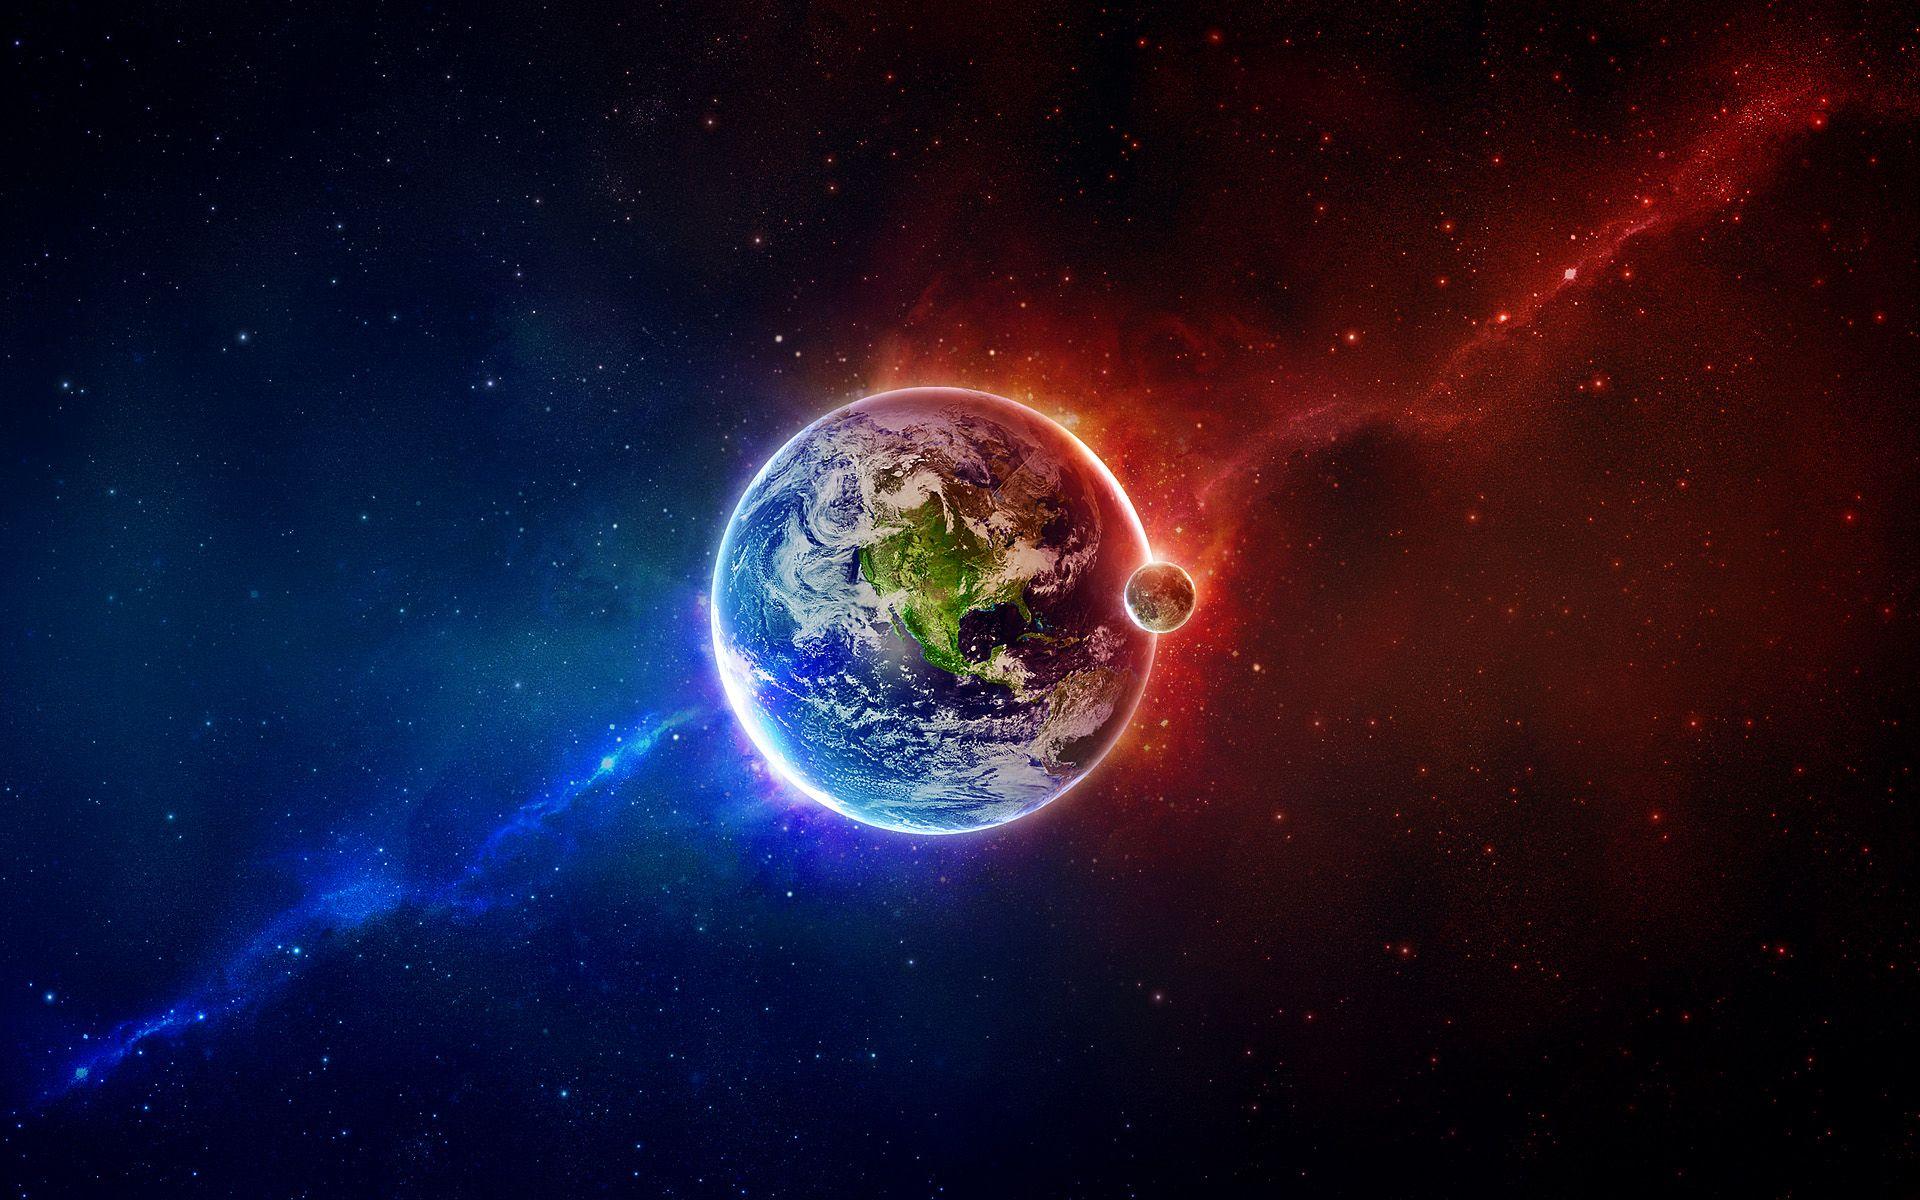 terre-lune-espace-infini_03